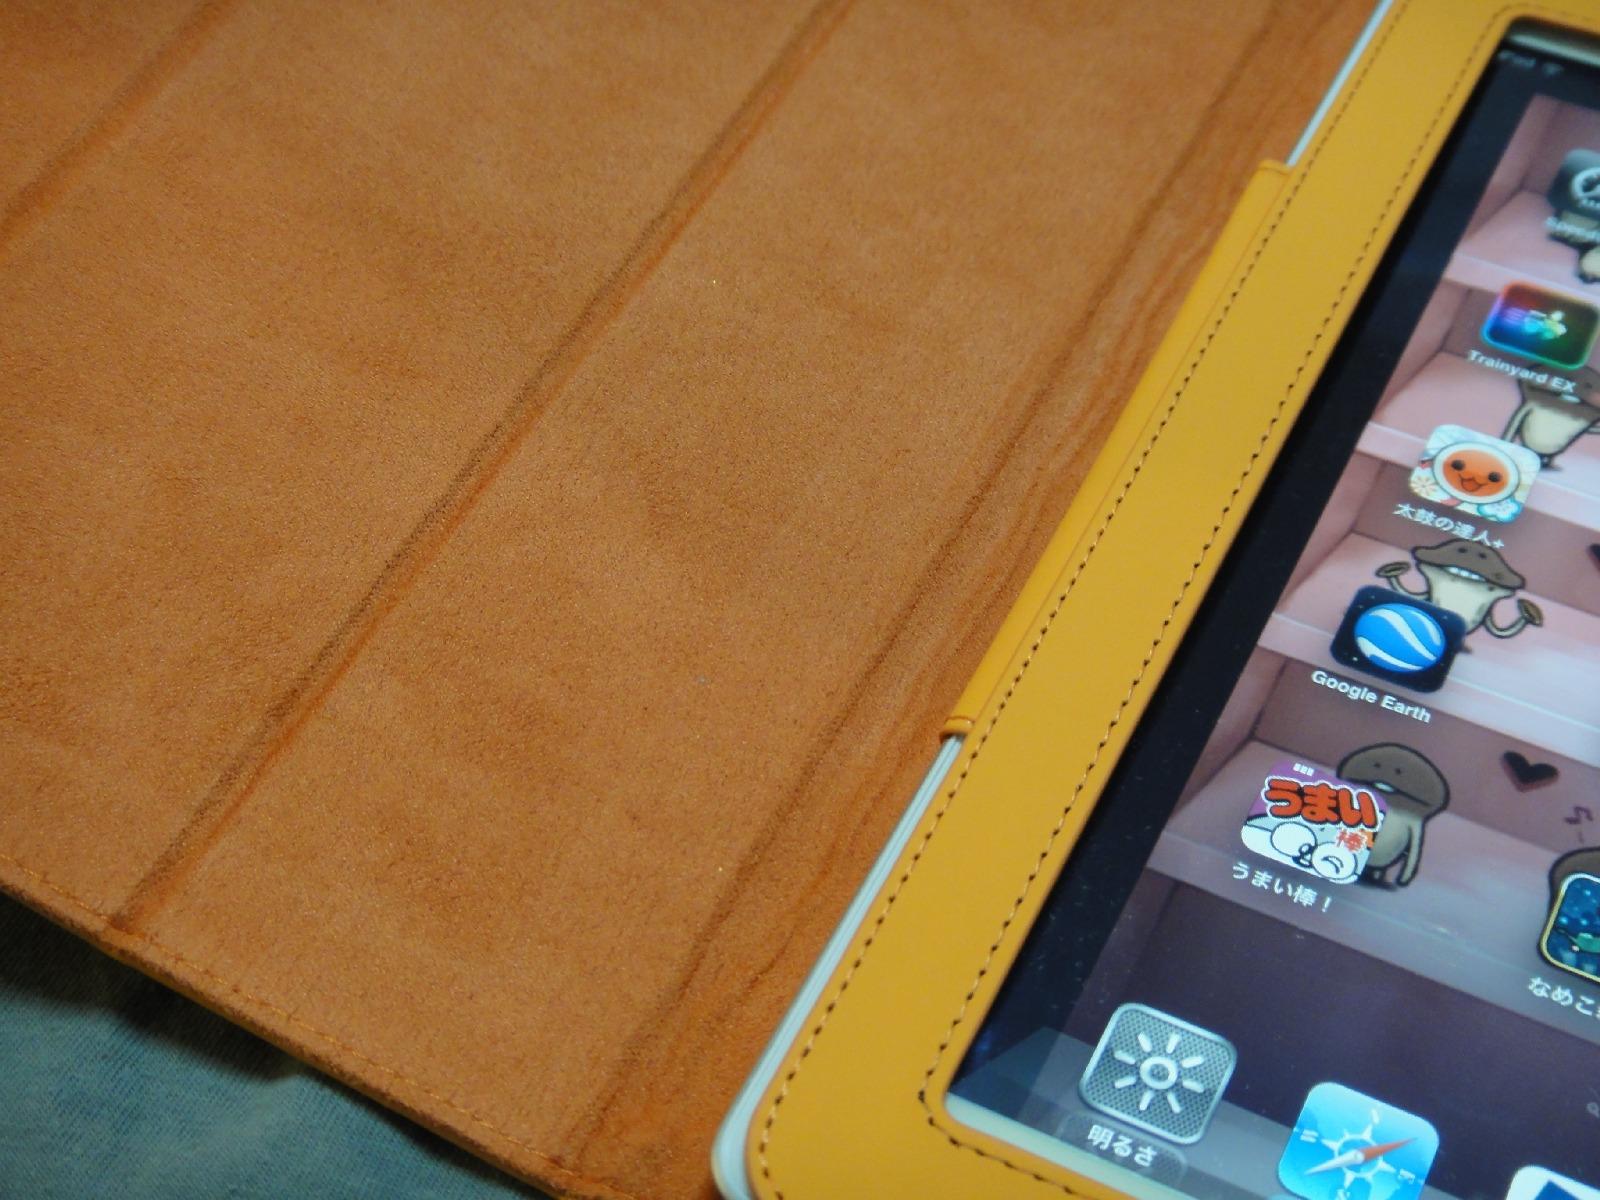 iBeansiPadcase_023.jpg